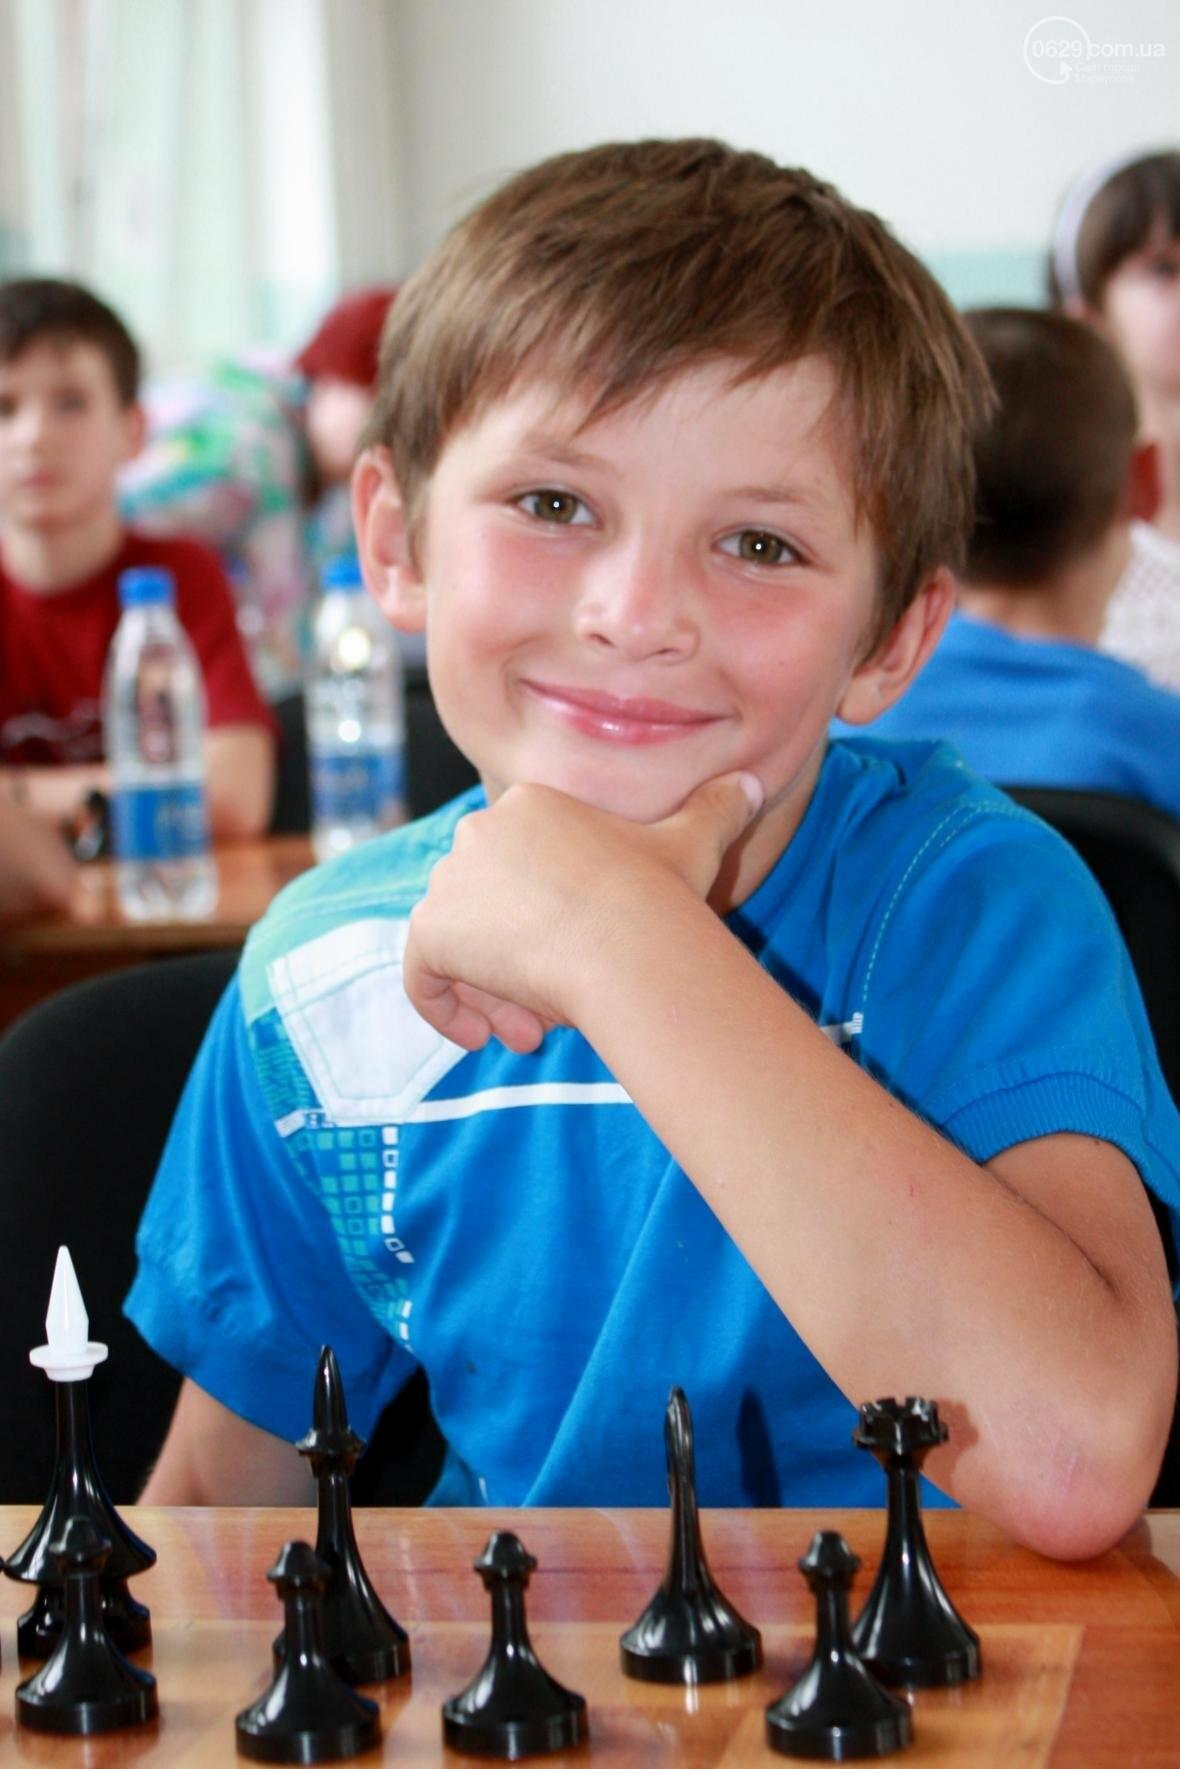 16-летний шахматист Леонид Данилов поедет на полуфинал чемпионата Украины по шахматам, фото-5